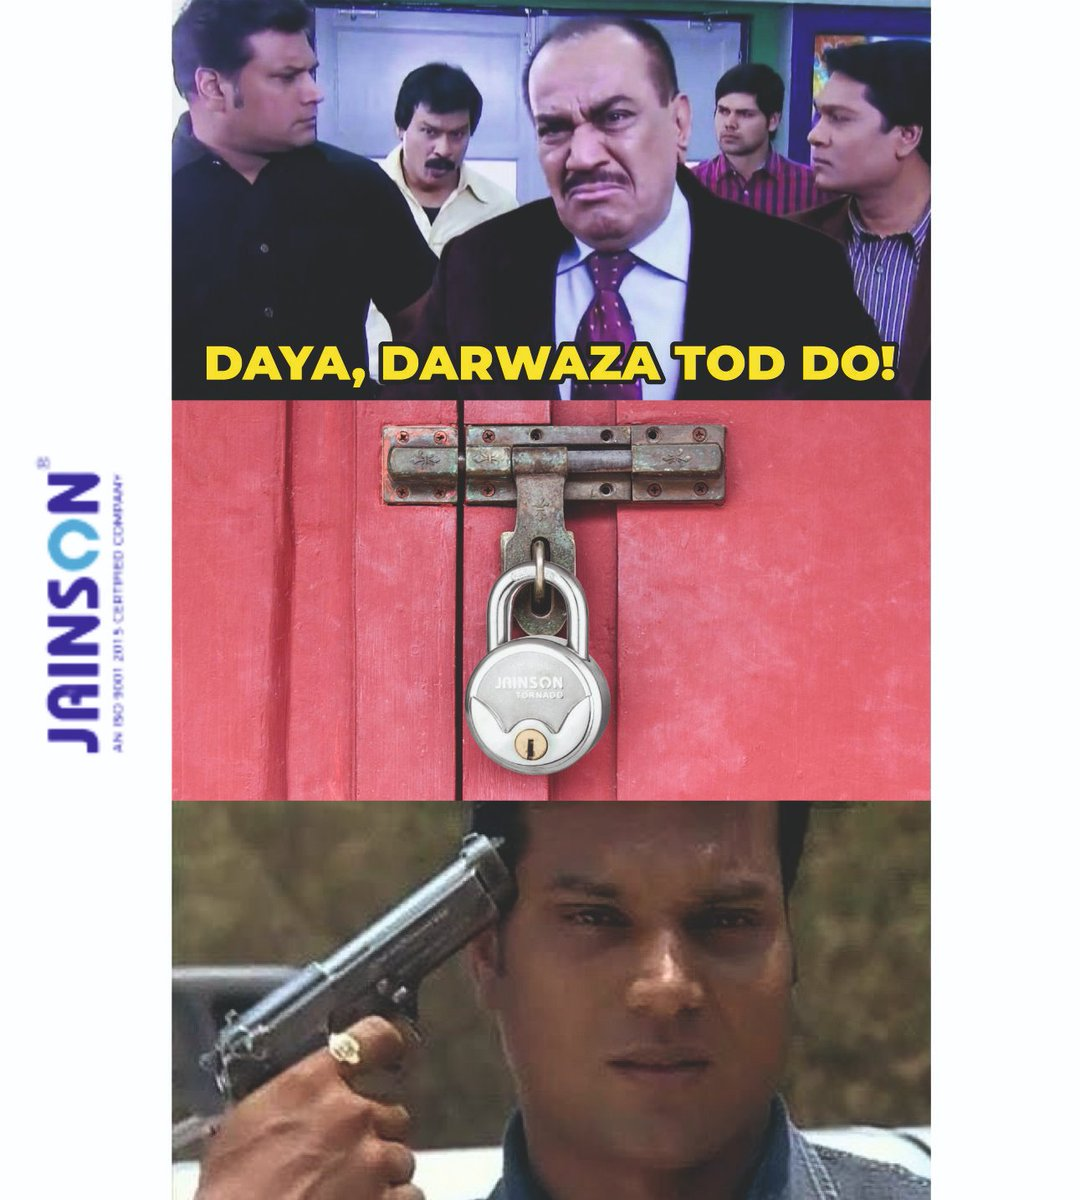 Here is one for all the CID fans!!   Daya, Darwaza tod do!  Well, not in the case of Jainson Locks. Share & Comment if you can relate to the meme.  #JainsonLocks #CIDMemes #Padlocks #HomeLocks #MainDoorLocks #CIDJokes #LockingSystems #LockTheDoorpic.twitter.com/wlgesepu0j